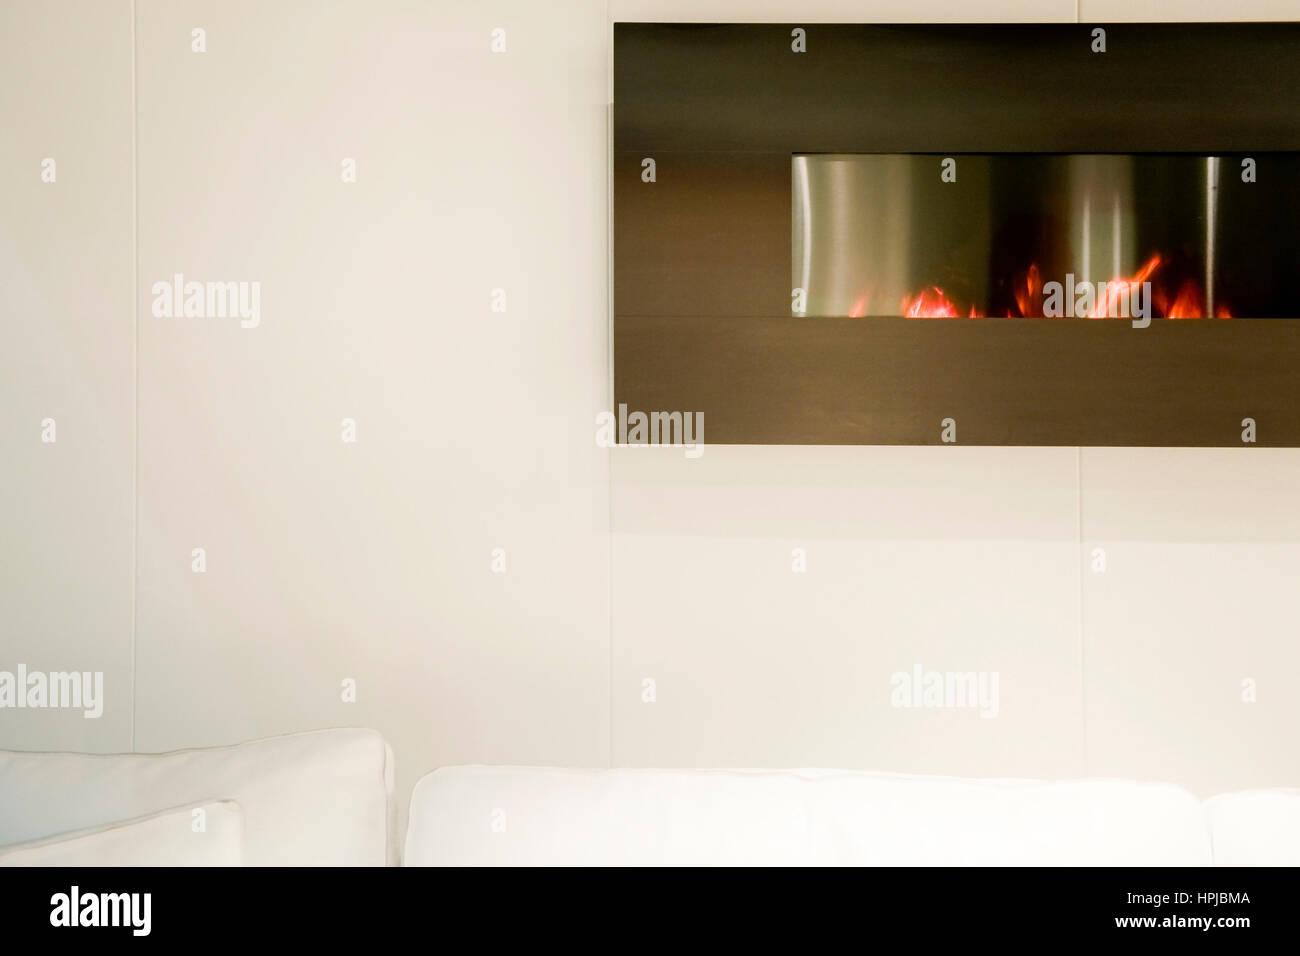 Moderner, eingebauter Kamin in Zimmerwand - modern living - Stock Image